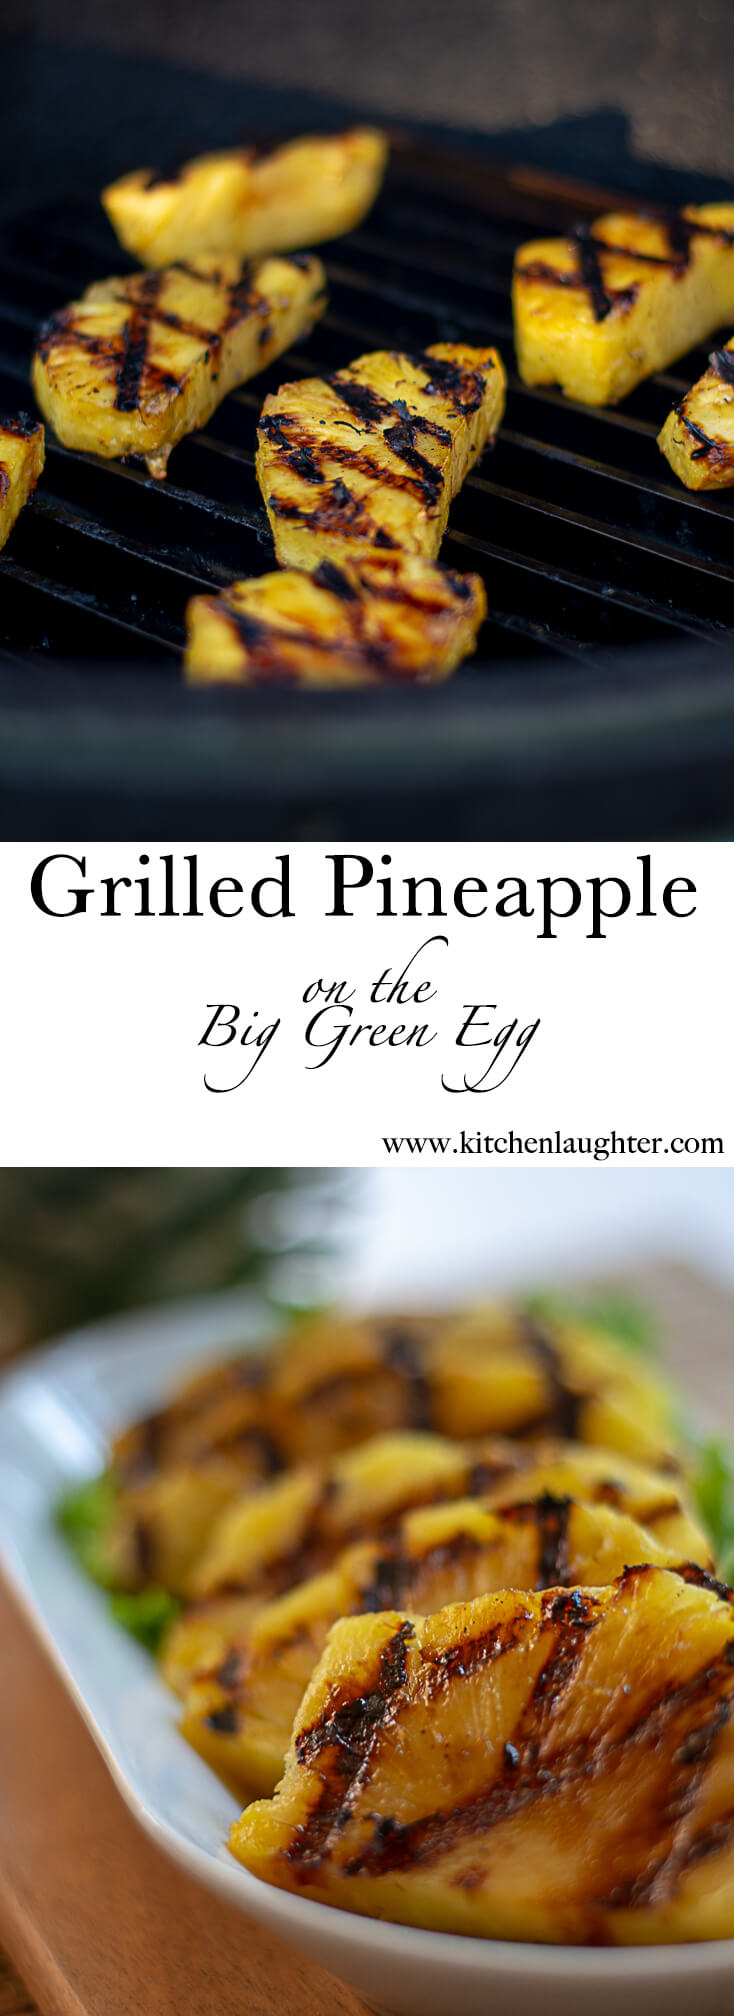 Grilled Pineapple Slices on the Big Green Egg #BGE #BigGreenEgg #Grilling #GrilledPineapple #Pineapple #GrilledFruit